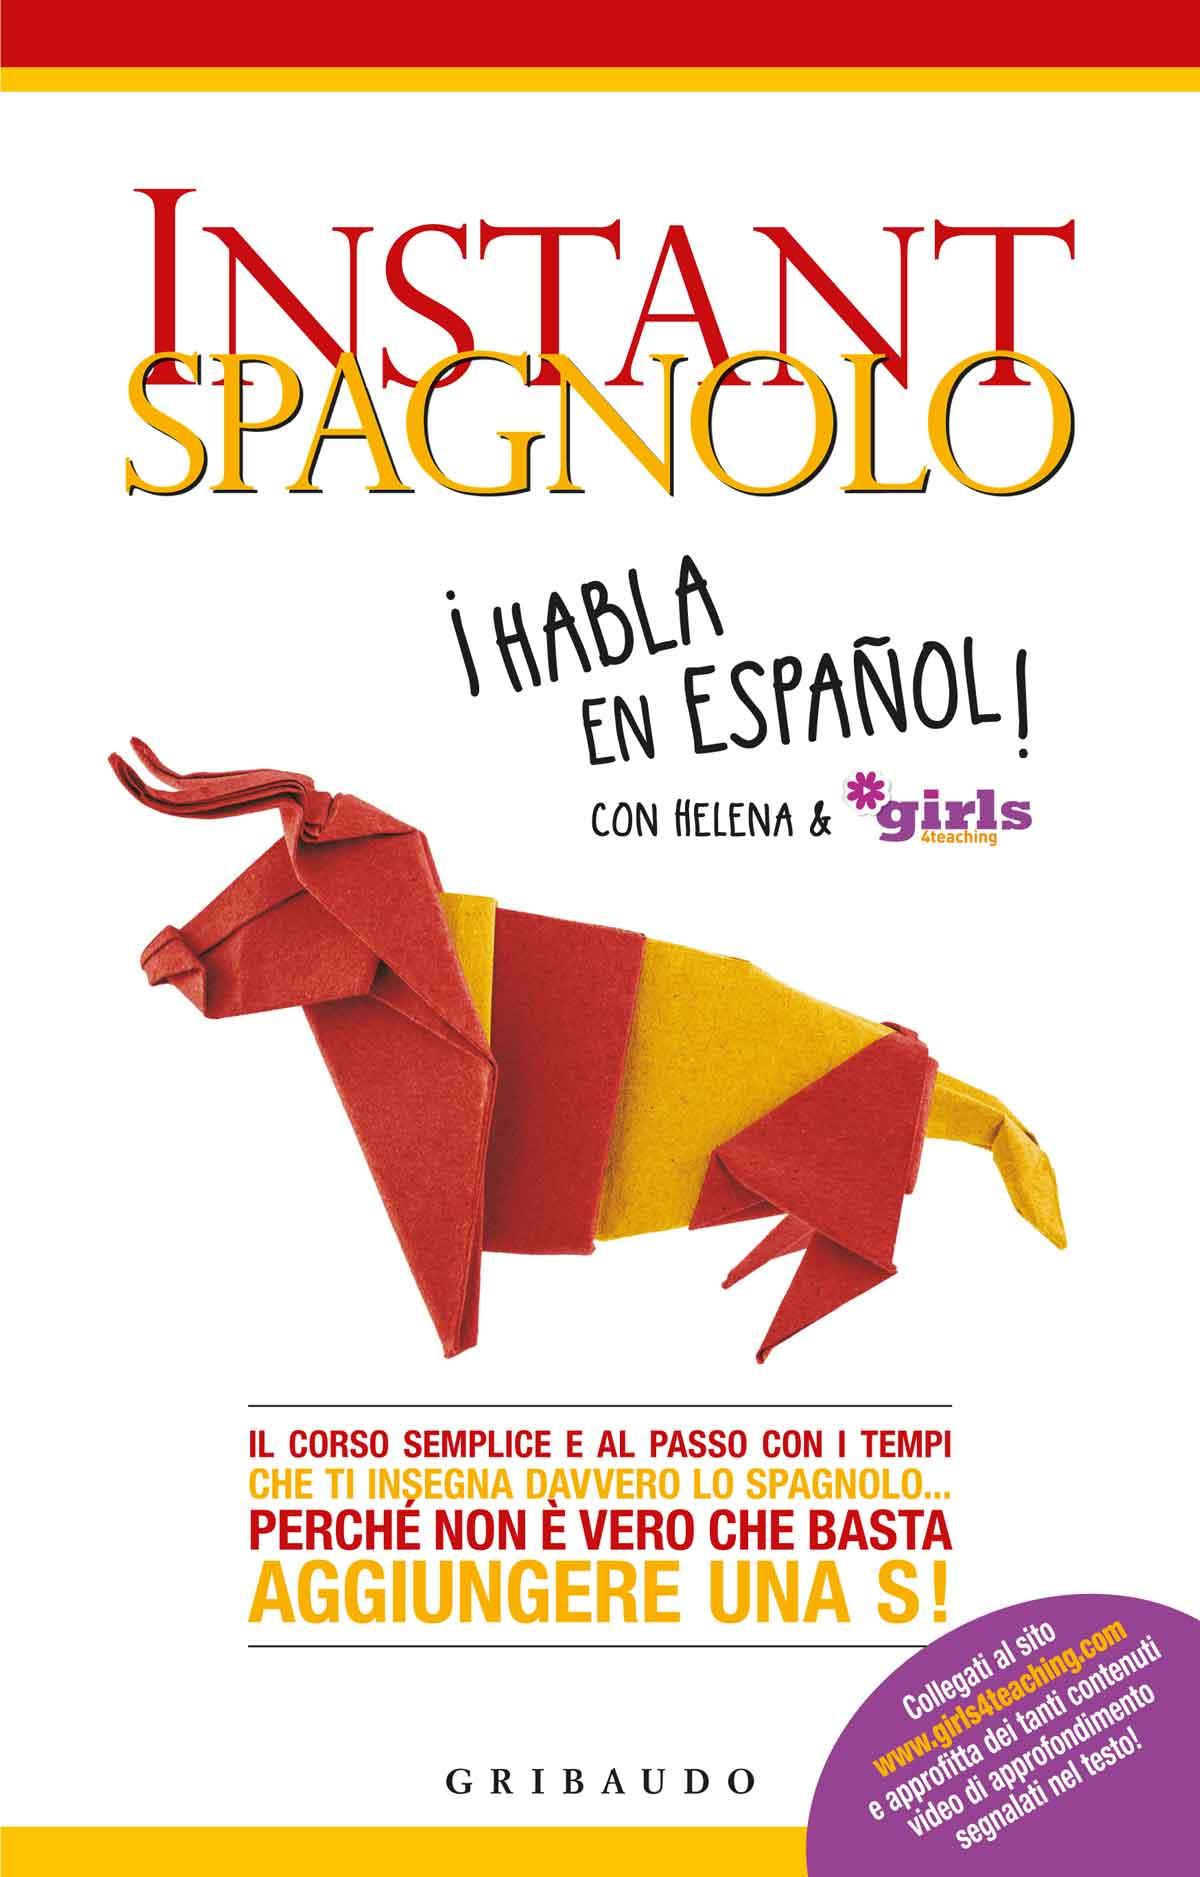 Instant spagnolo